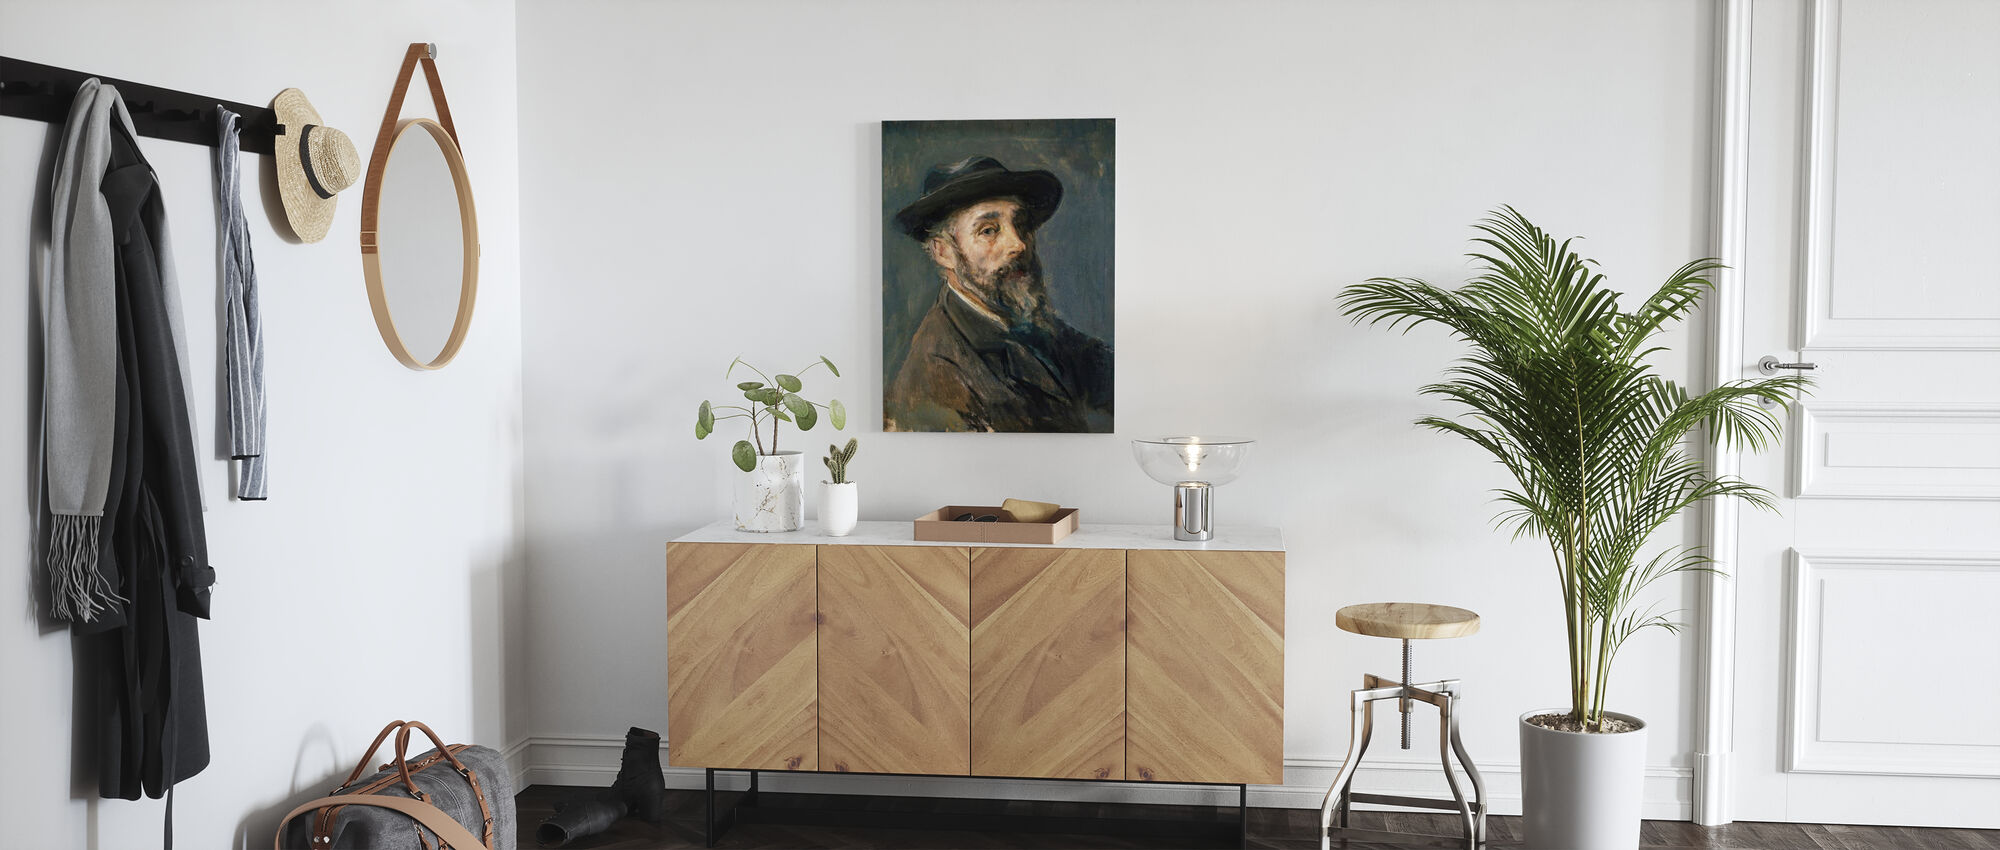 Self-portrait with a Hat - Ignacio Pinazo Camarlench - Canvas print - Hallway